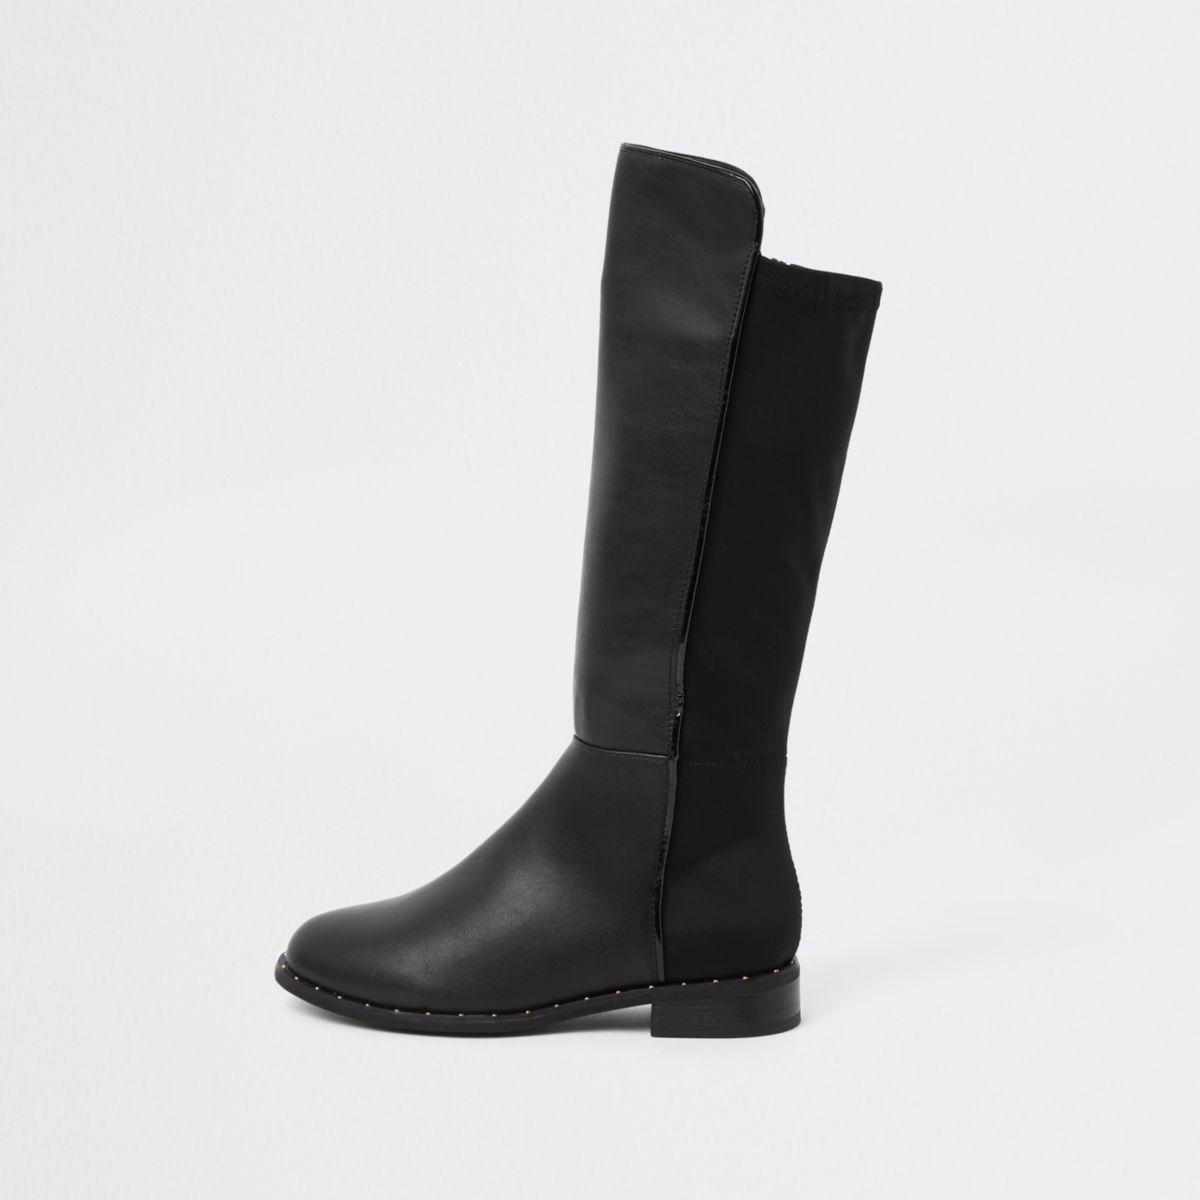 Girls black knee high studded boots